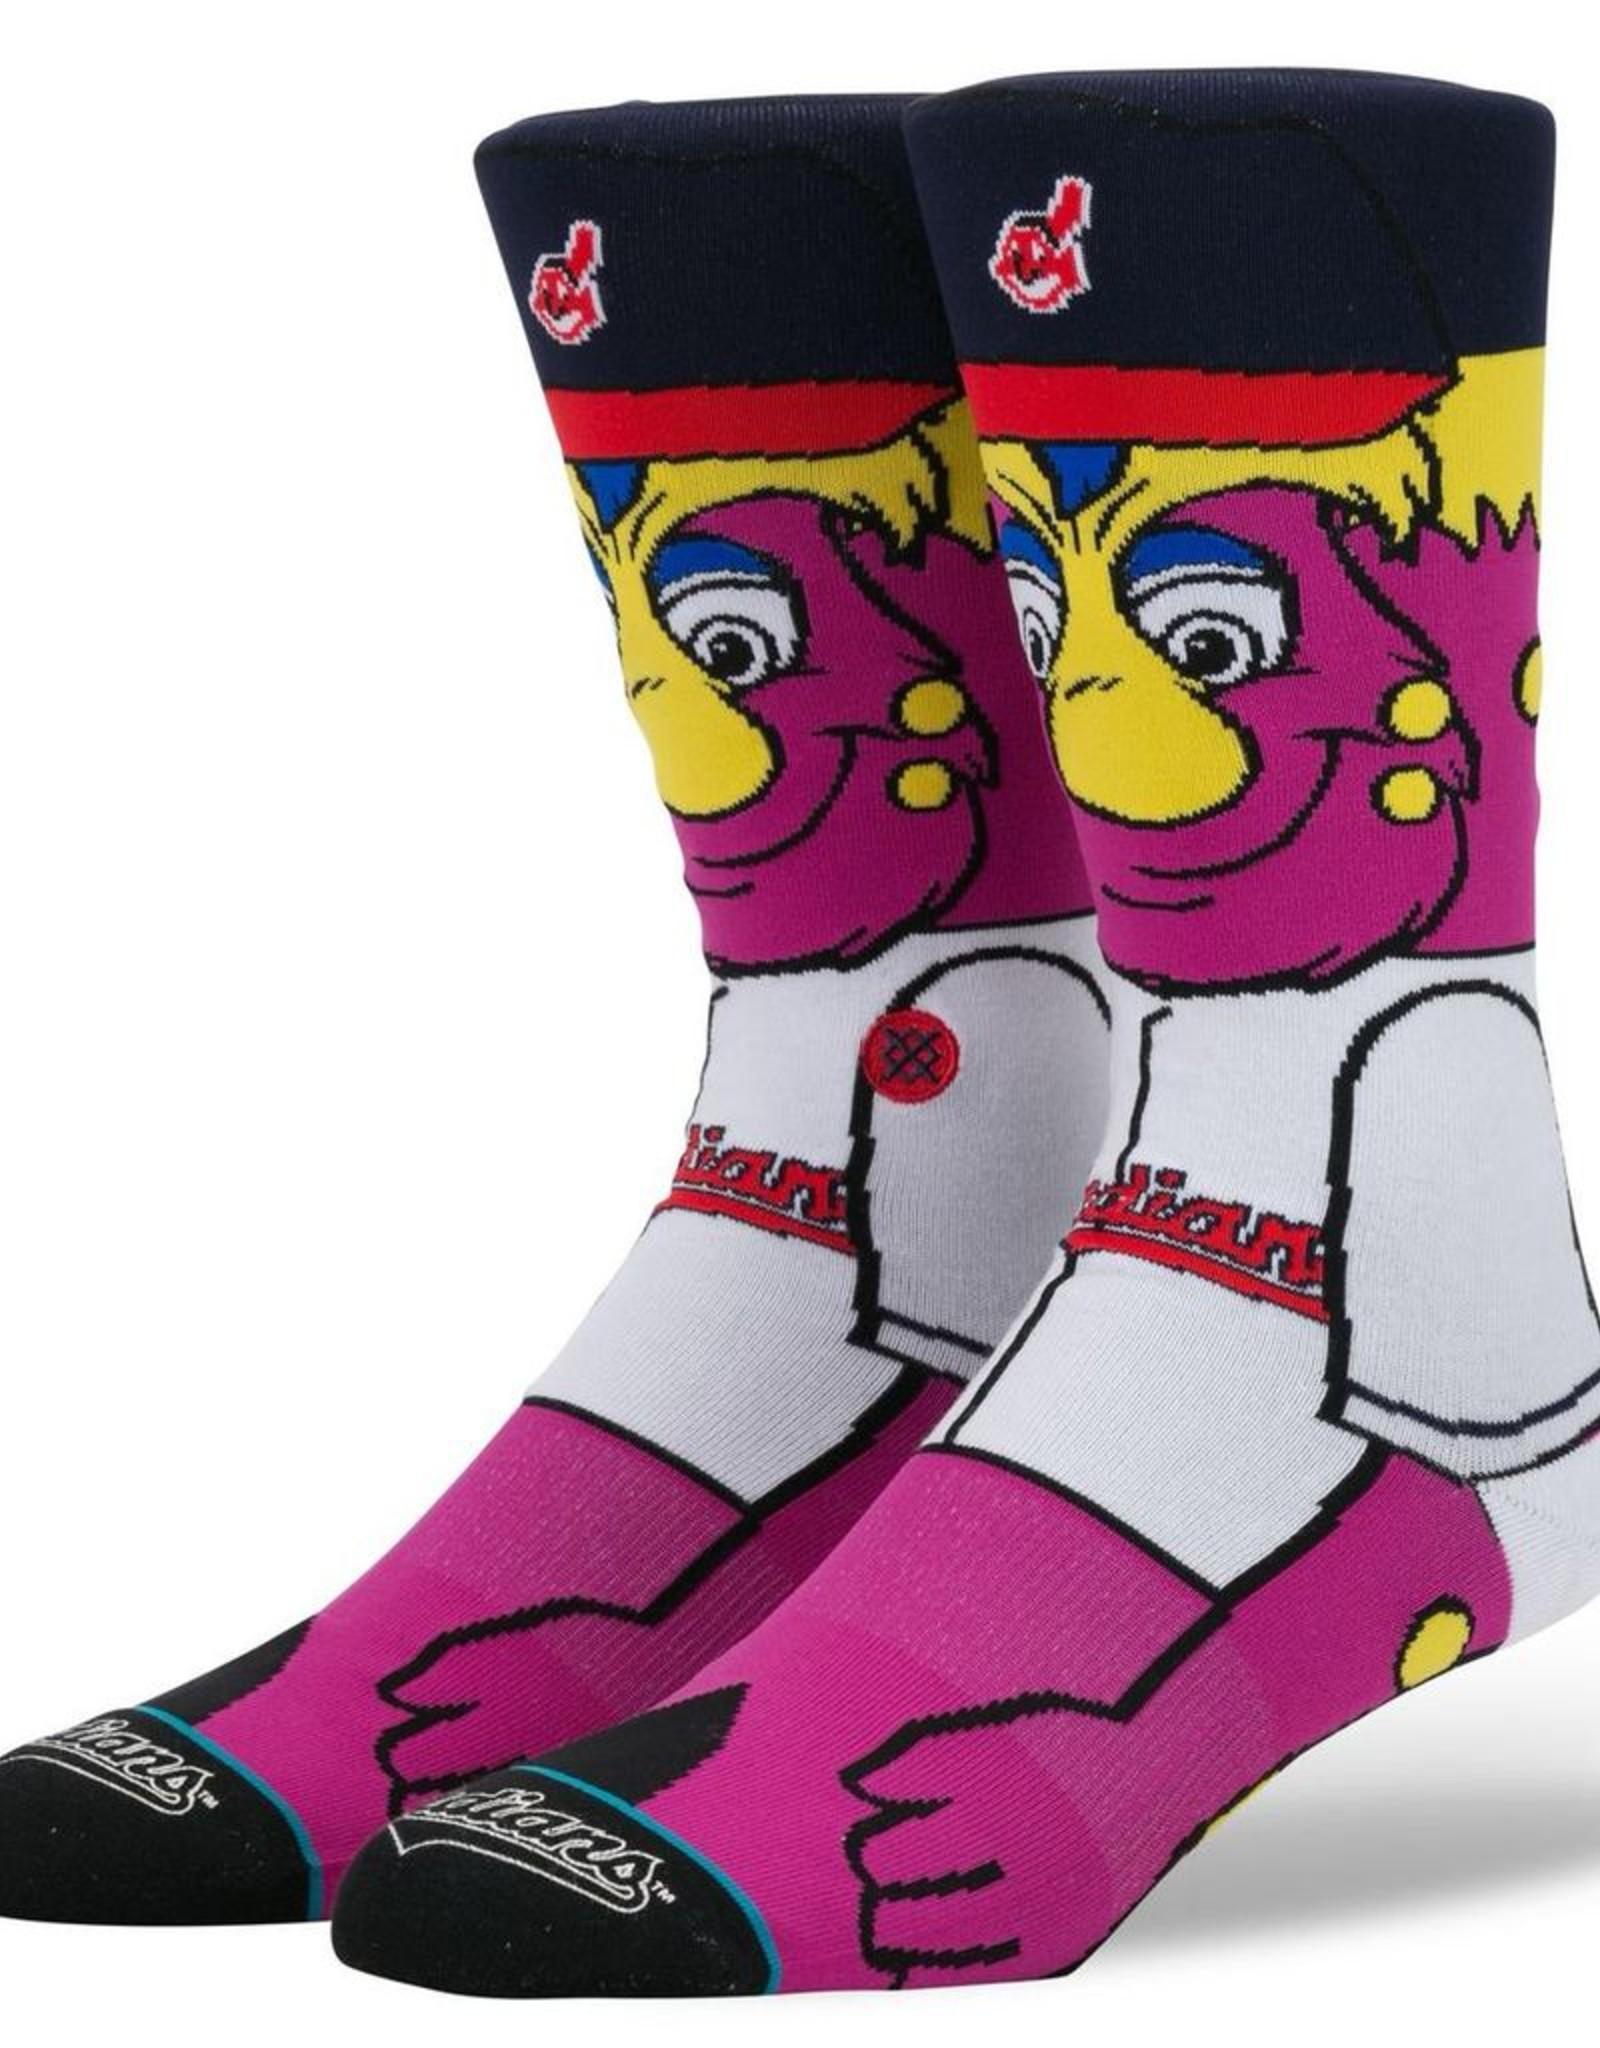 STANCE Cleveland Indians Stance Youth Slider Crew Socks